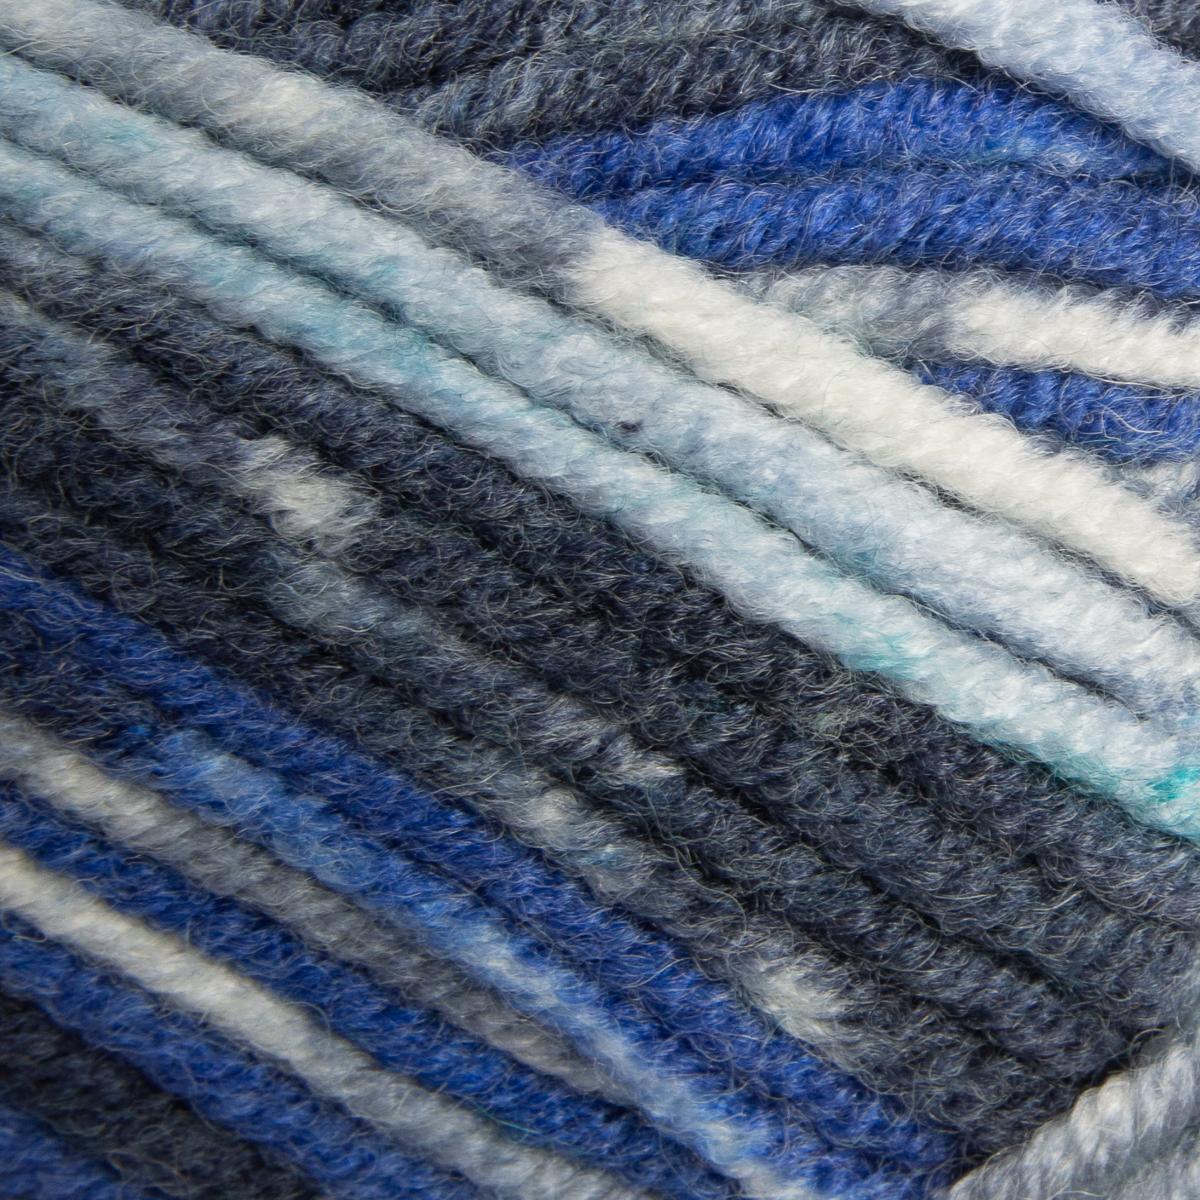 3pk-Lion-Brand-Woolspun-Acrylic-amp-Wool-Yarn-Bulky-5-Knit-Crocheting-Skeins-Soft thumbnail 59